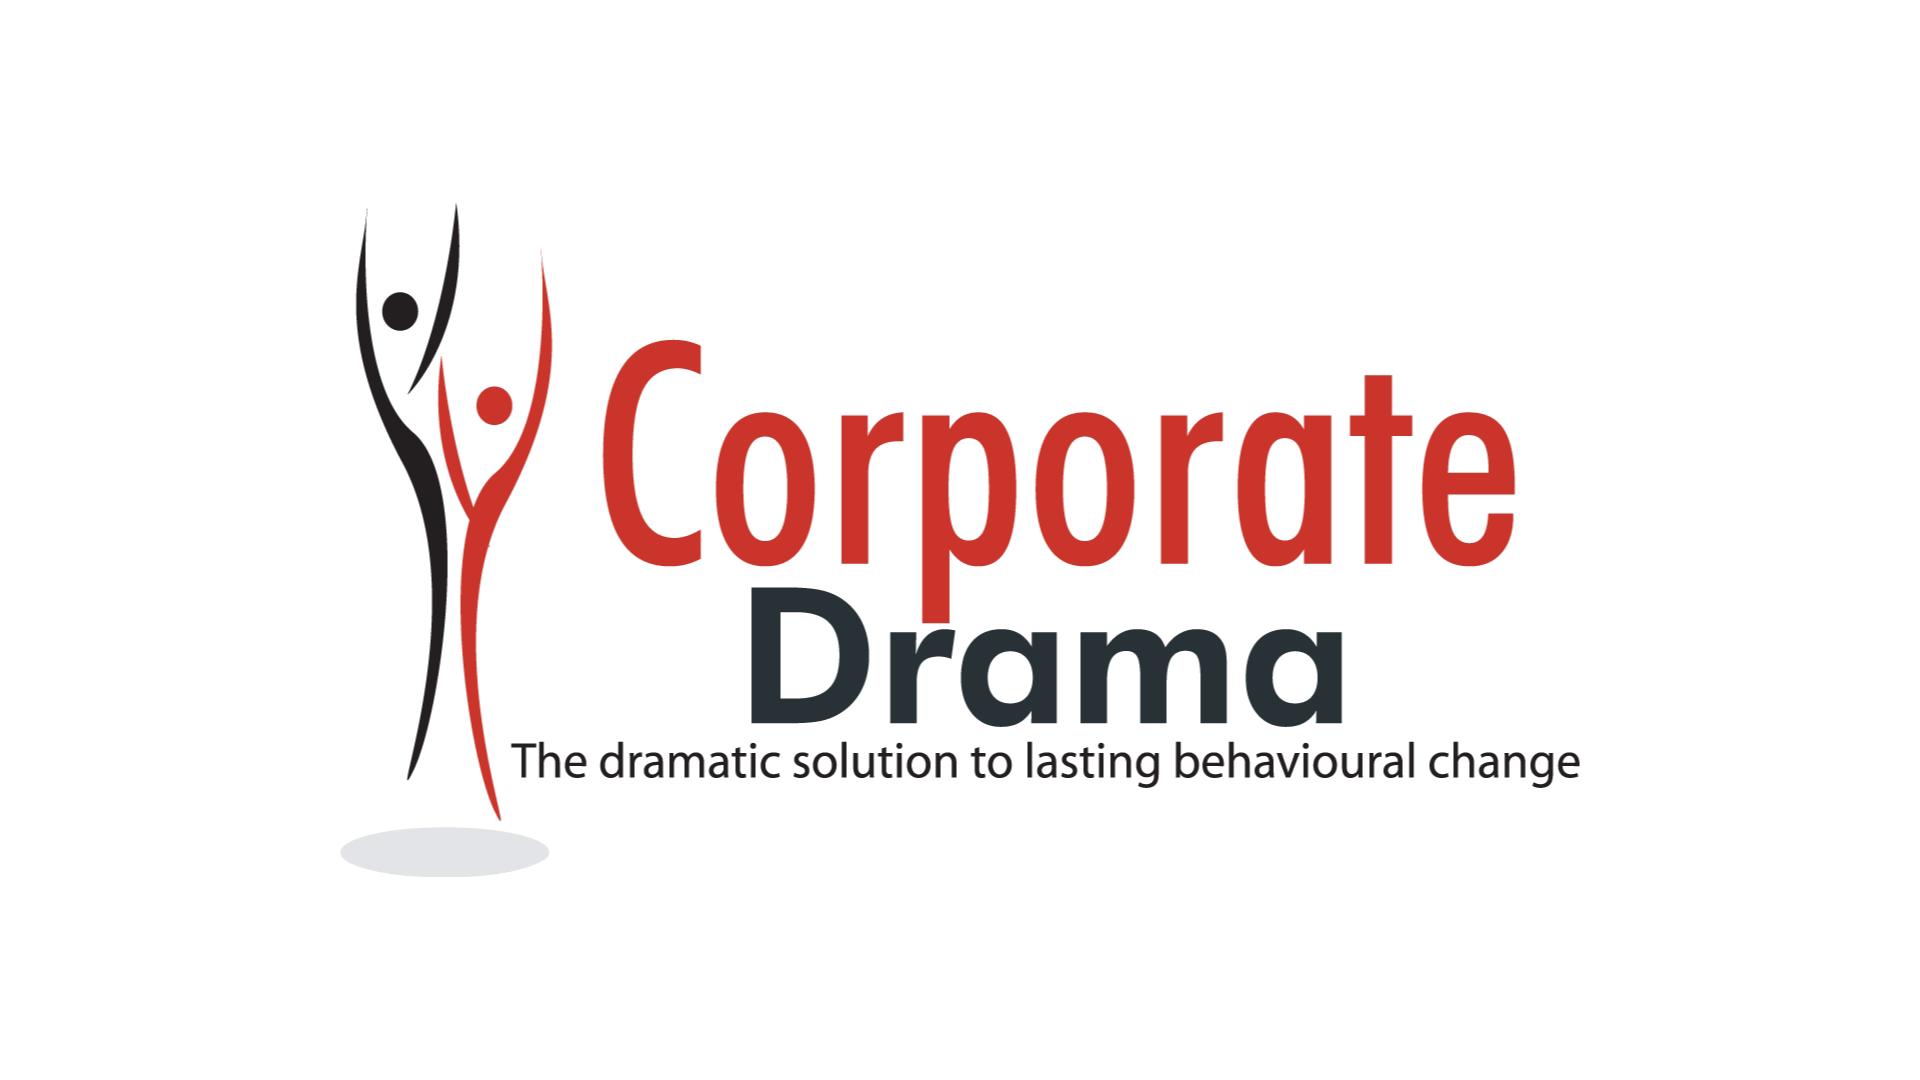 Corporate Drama